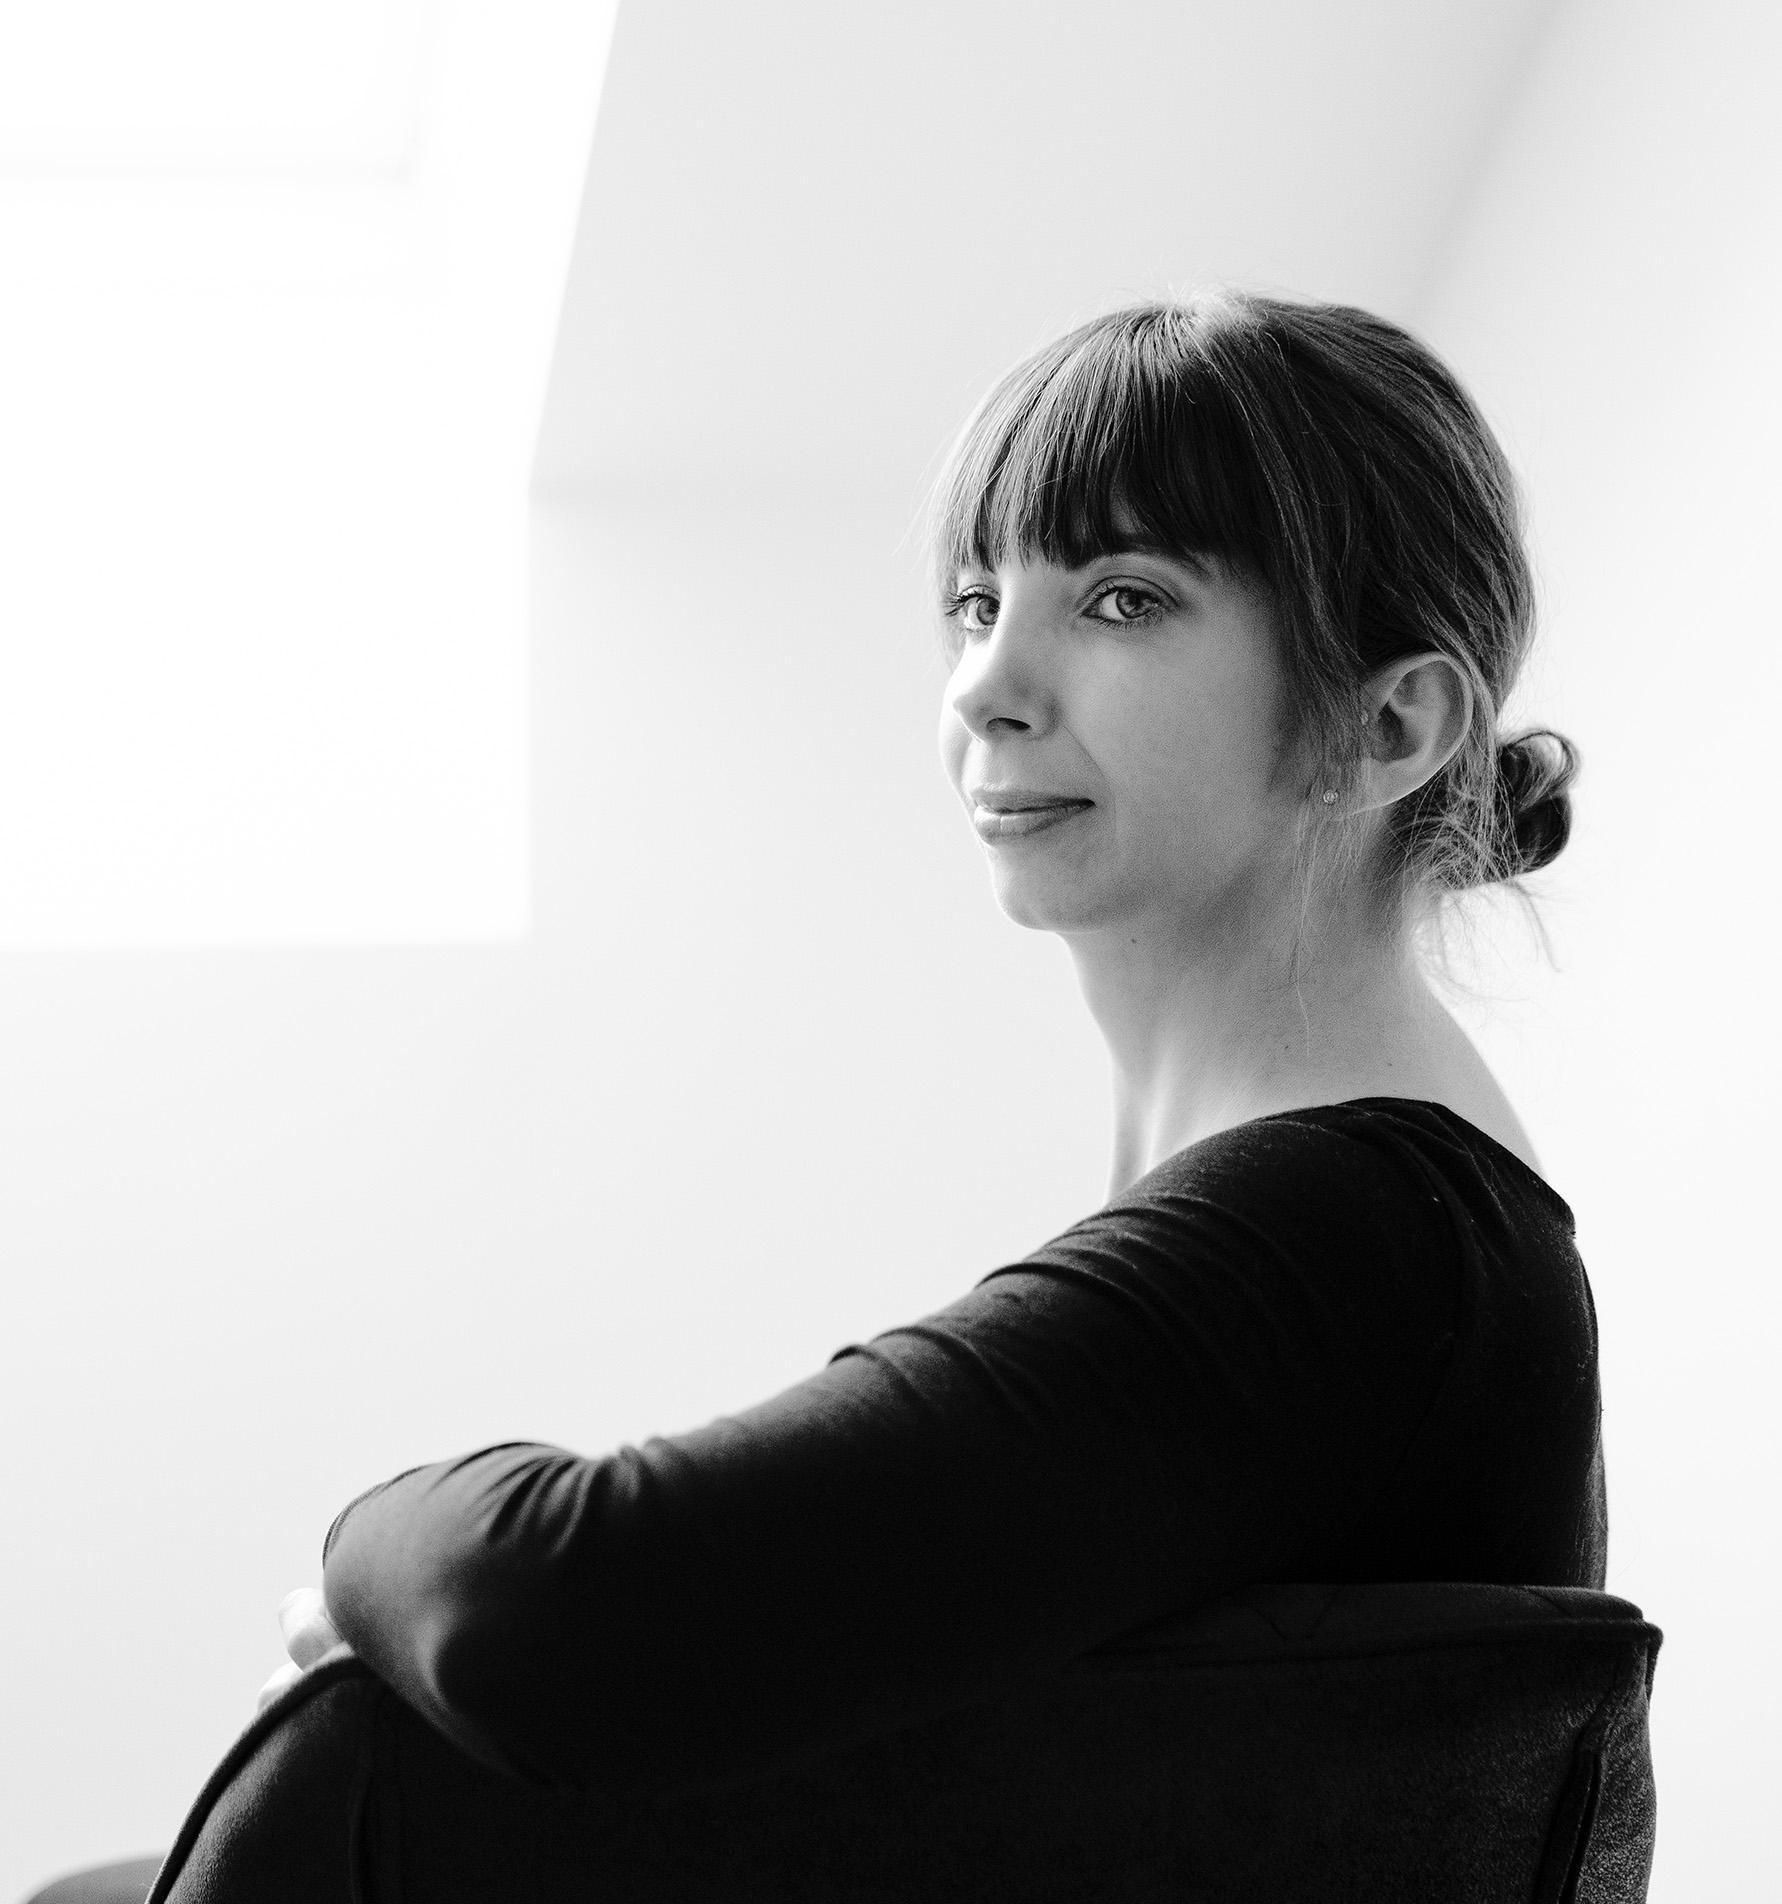 Portrait der Conversory Mitarbeiterin Barbara Zündel-Farnholz